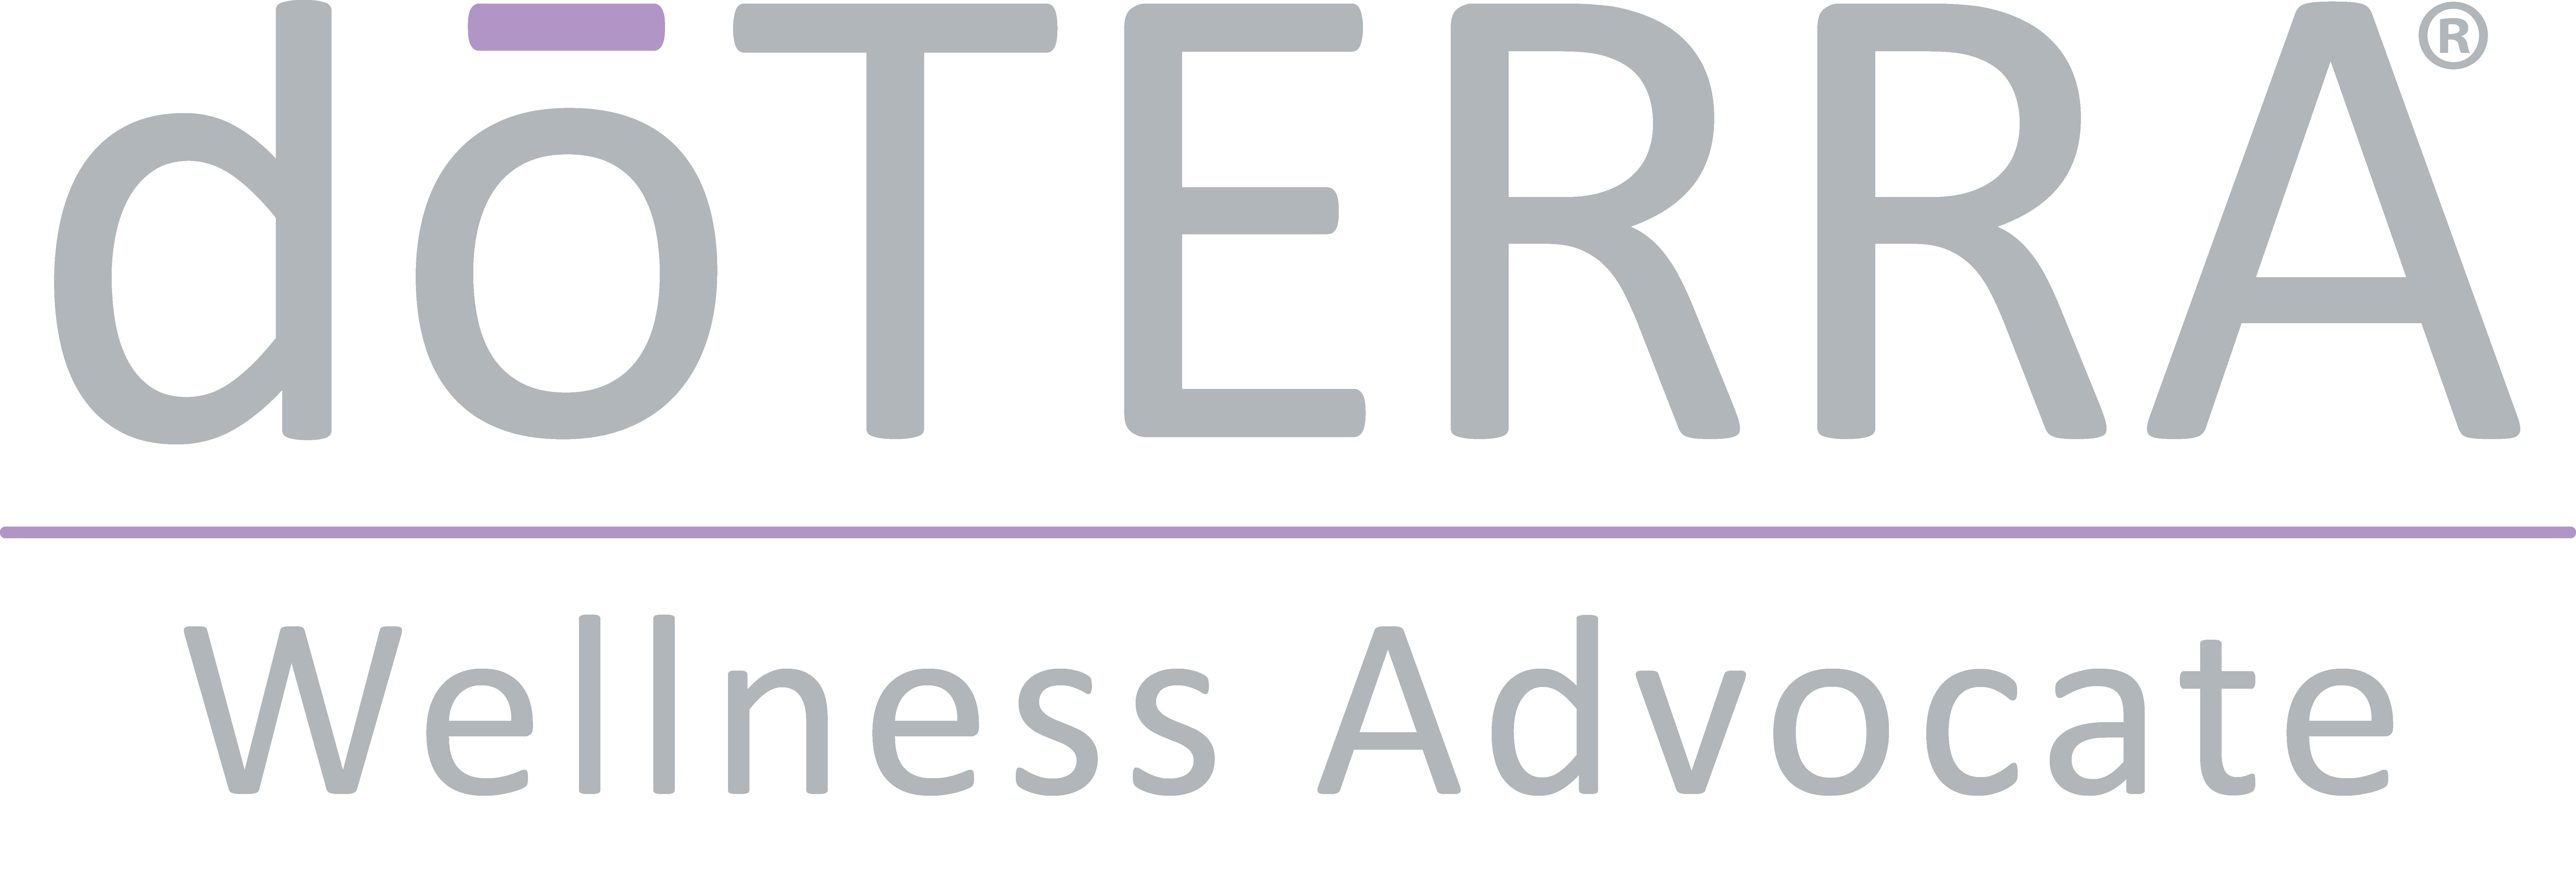 doterra-wellness-advocate-colors[1]